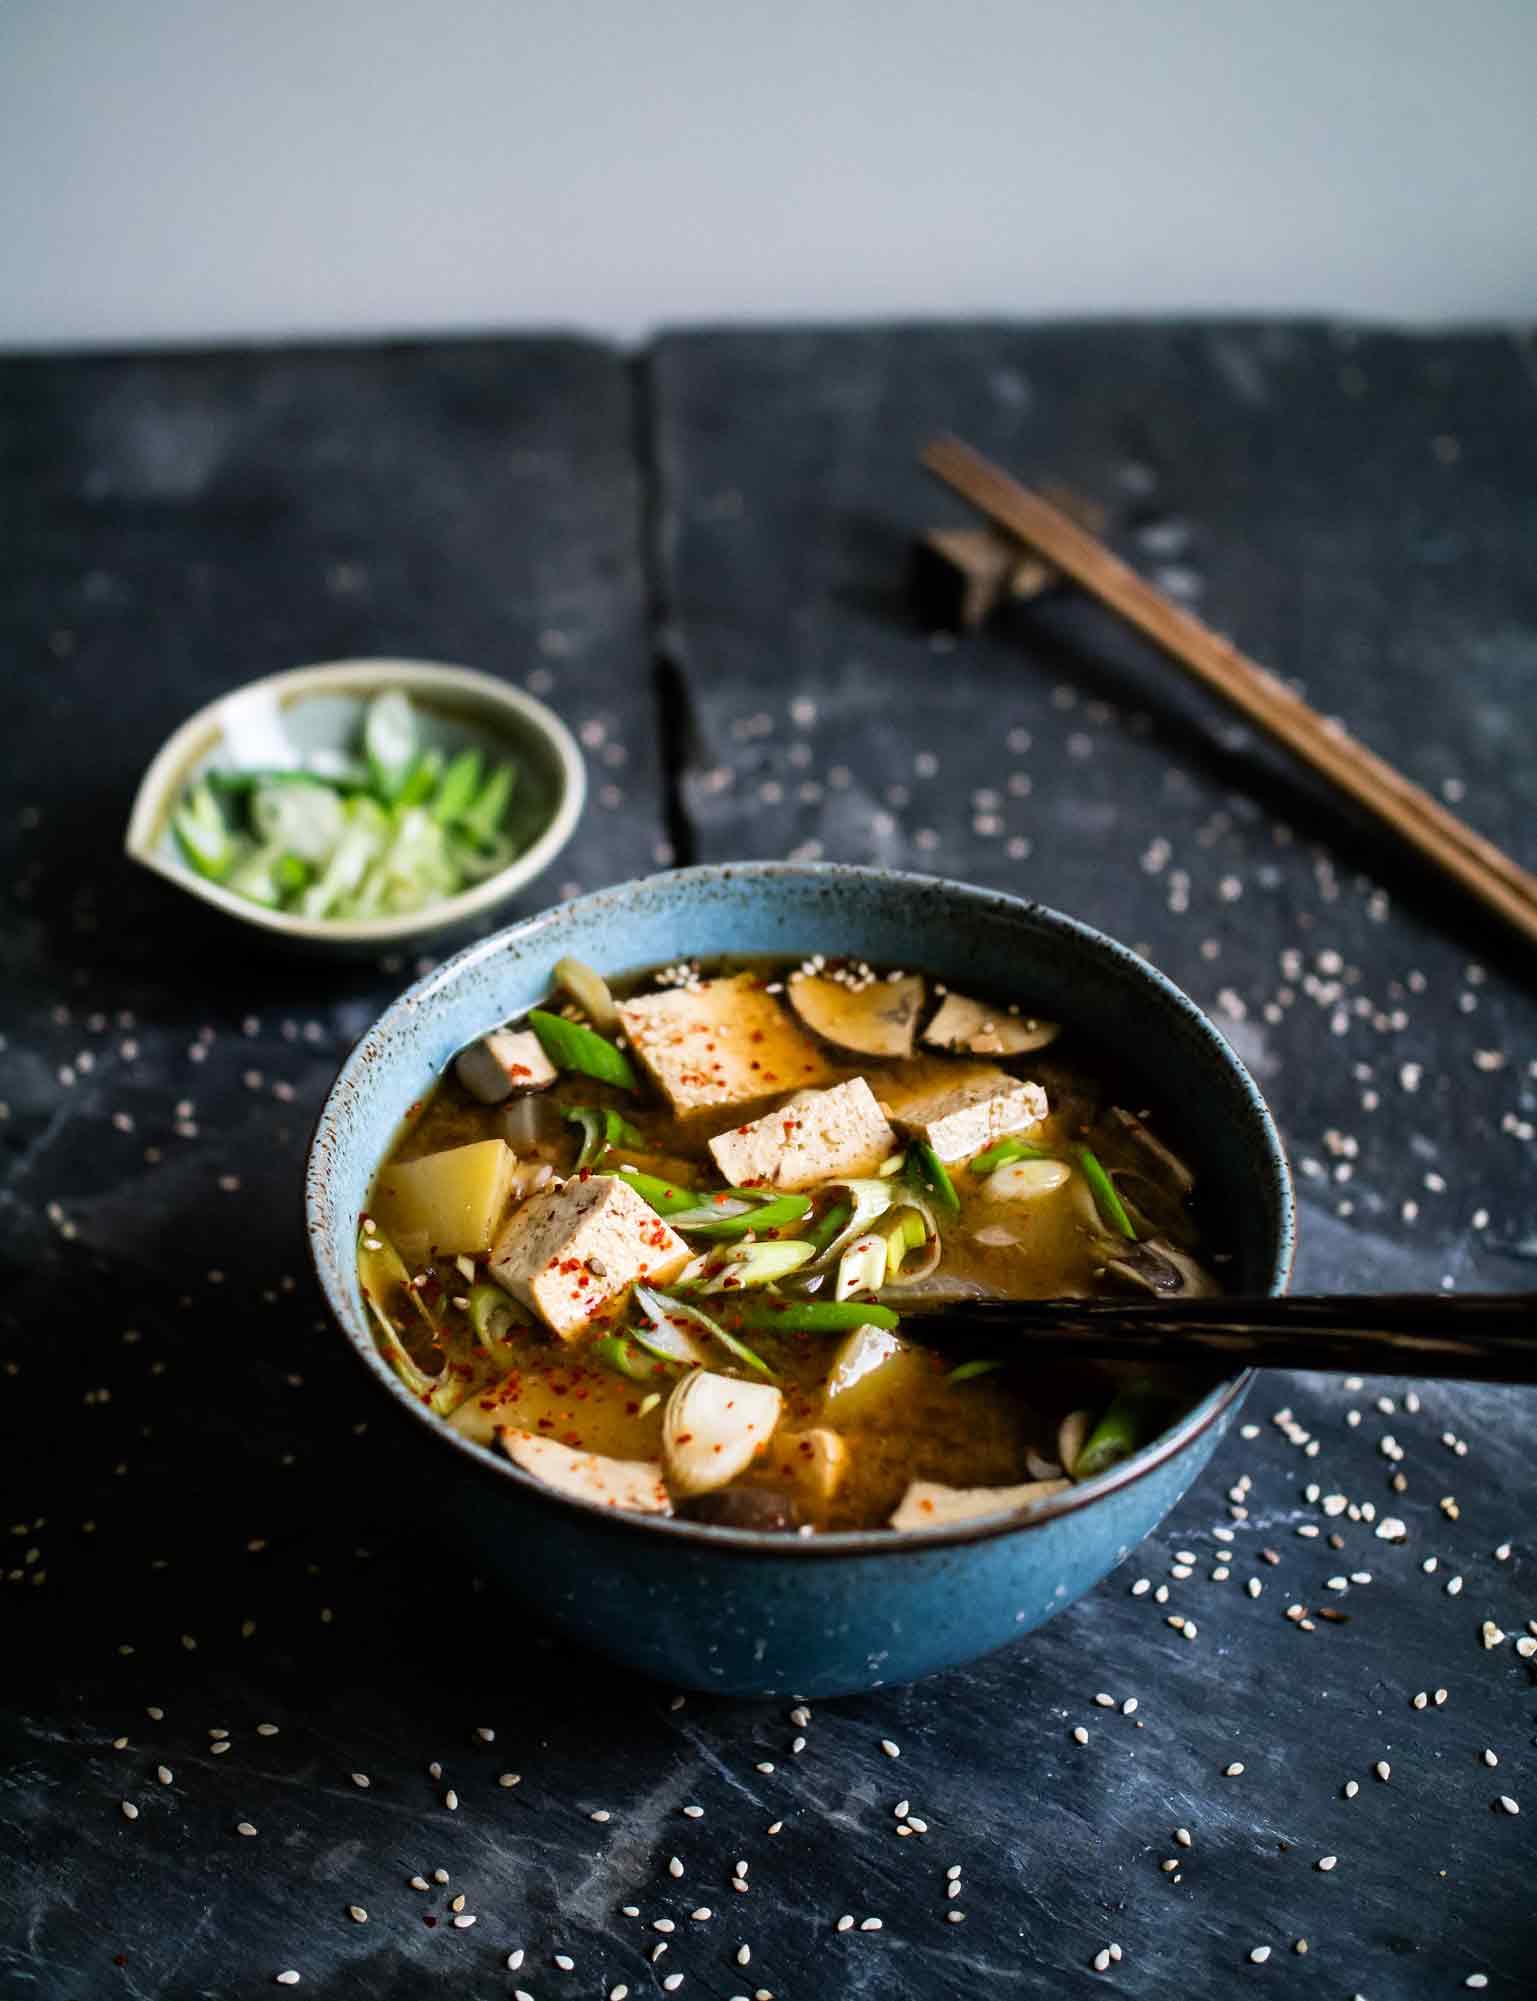 Doenjang jjigae | Vegan Korean Stew | www.discoverdelicious.org | Discover Delicious